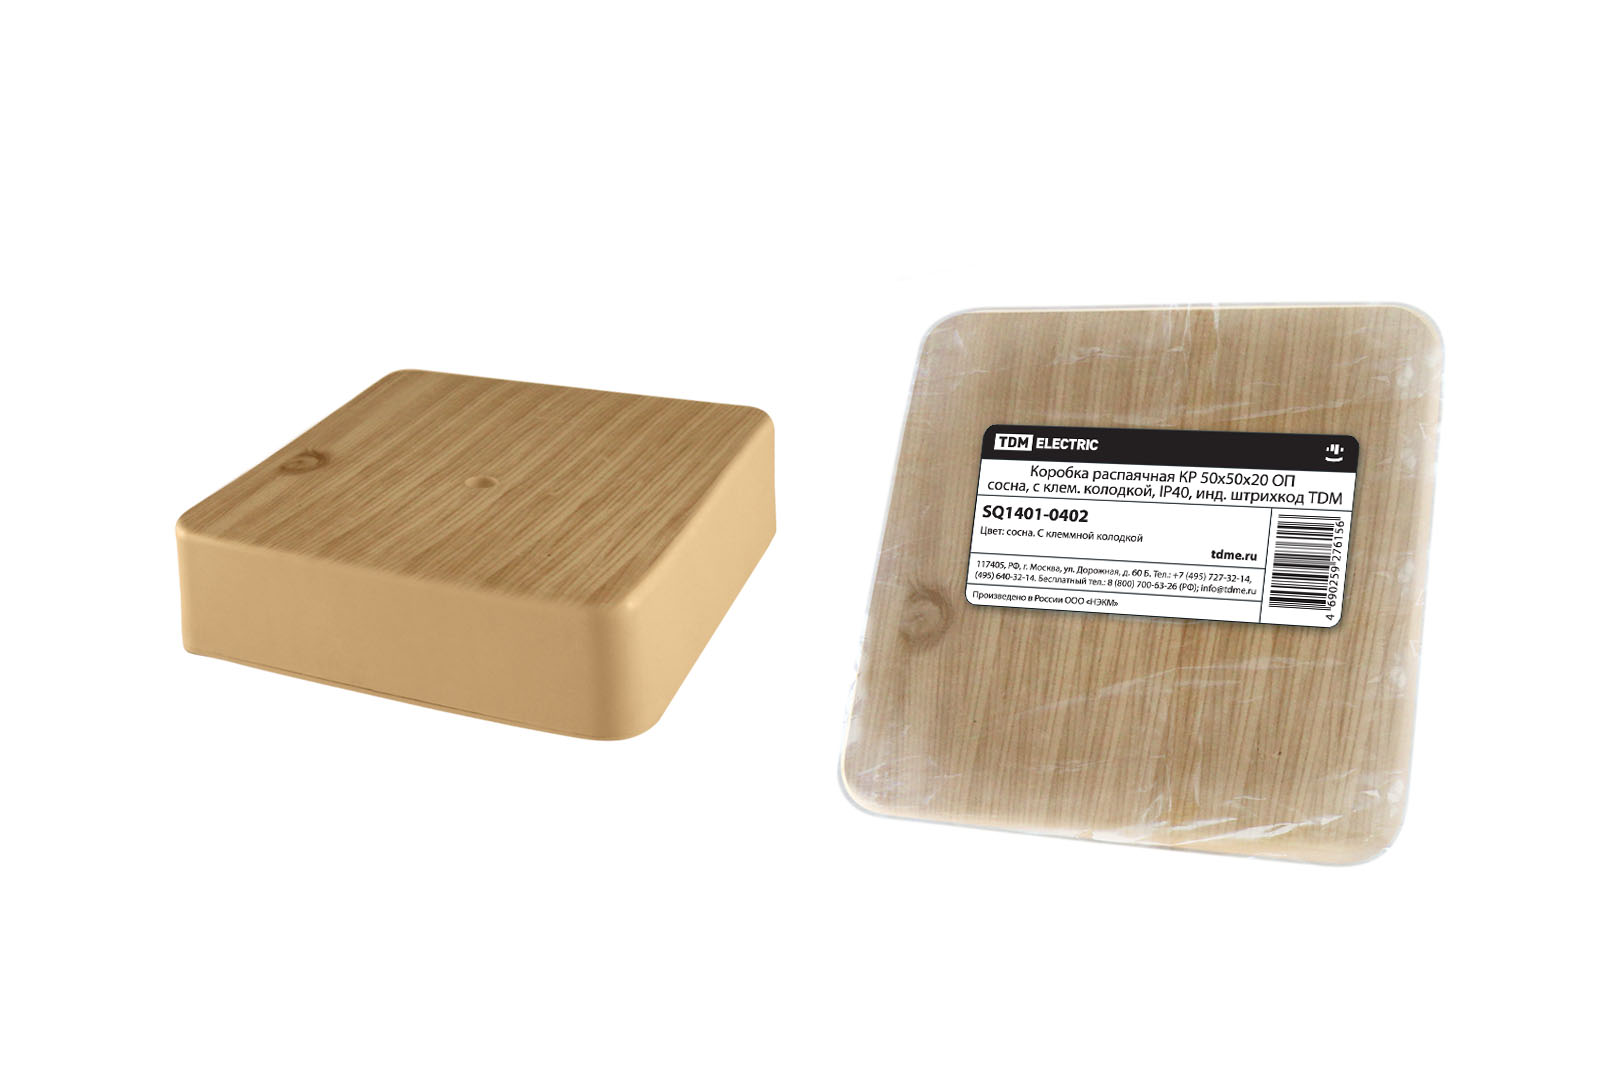 Фото Коробка распаячная КР 50х50х20 ОП сосна, с клем. колодкой, IP40, инд. штрихкод TDM {SQ1401-0402}